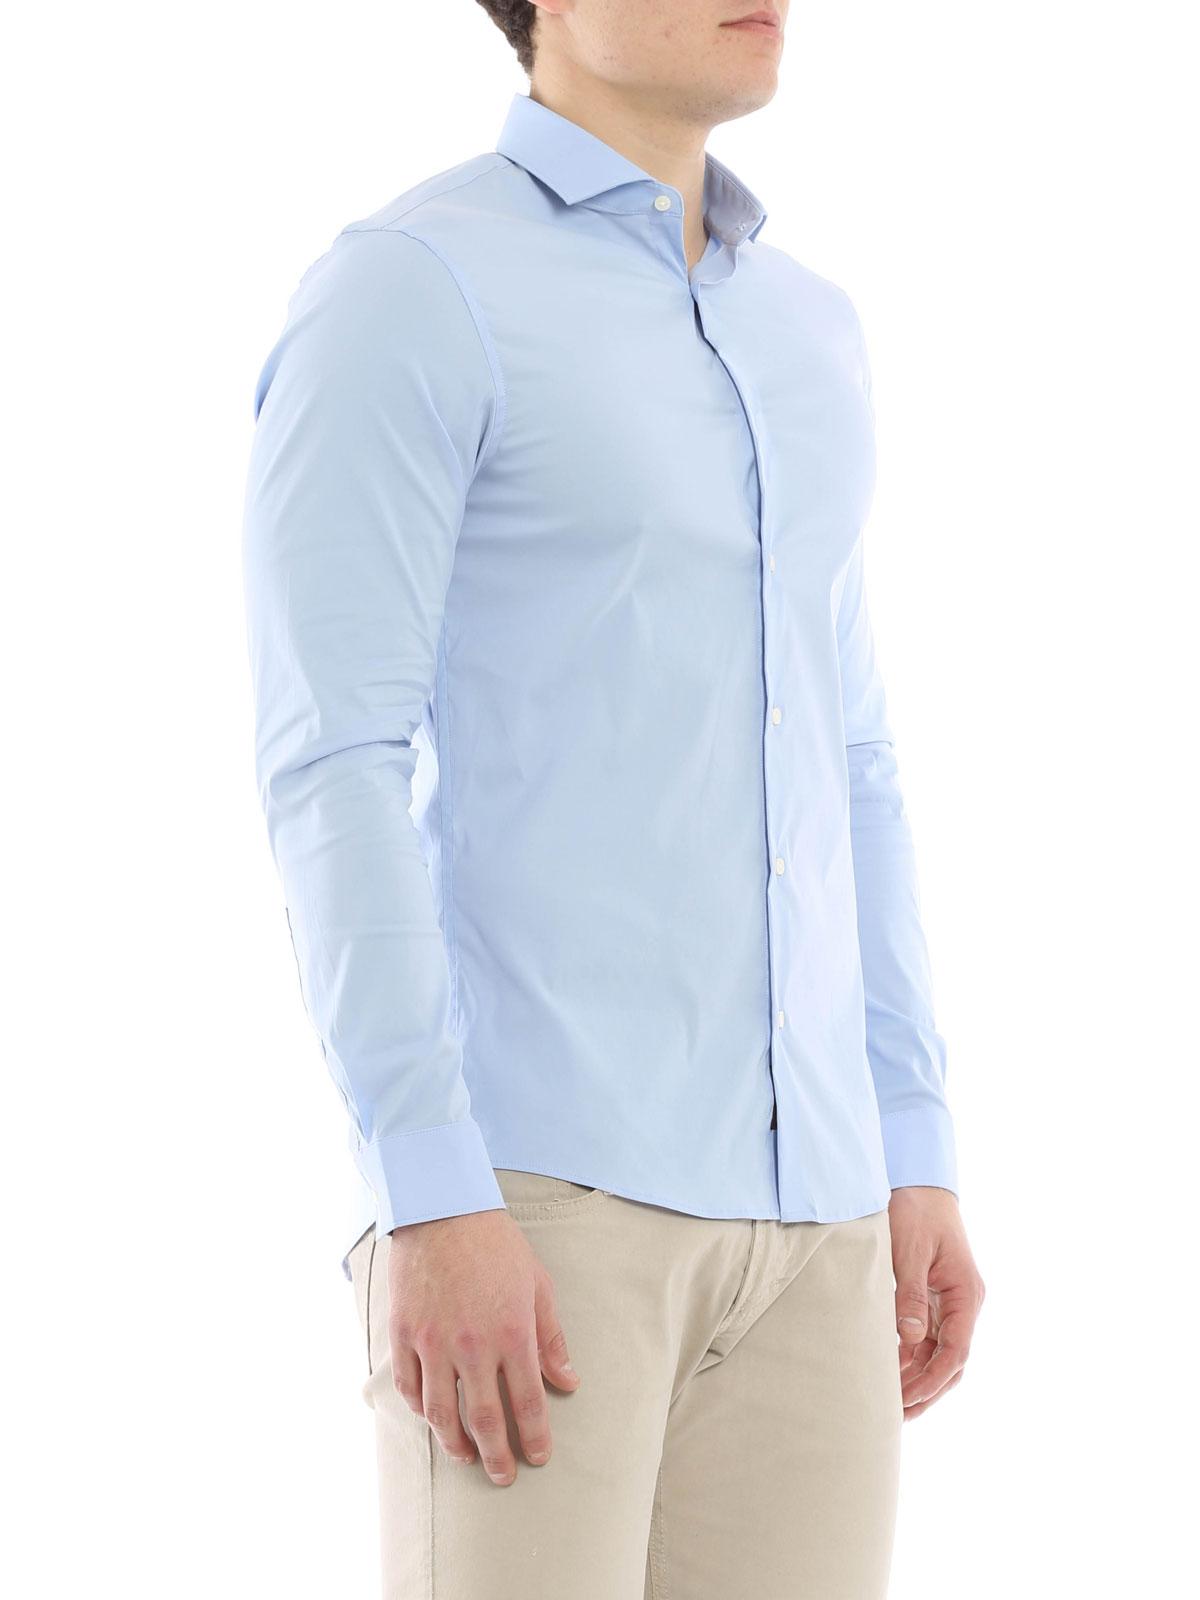 Stretch cotton slim fit shirt by michael kors shirts for Slim fit cotton shirts